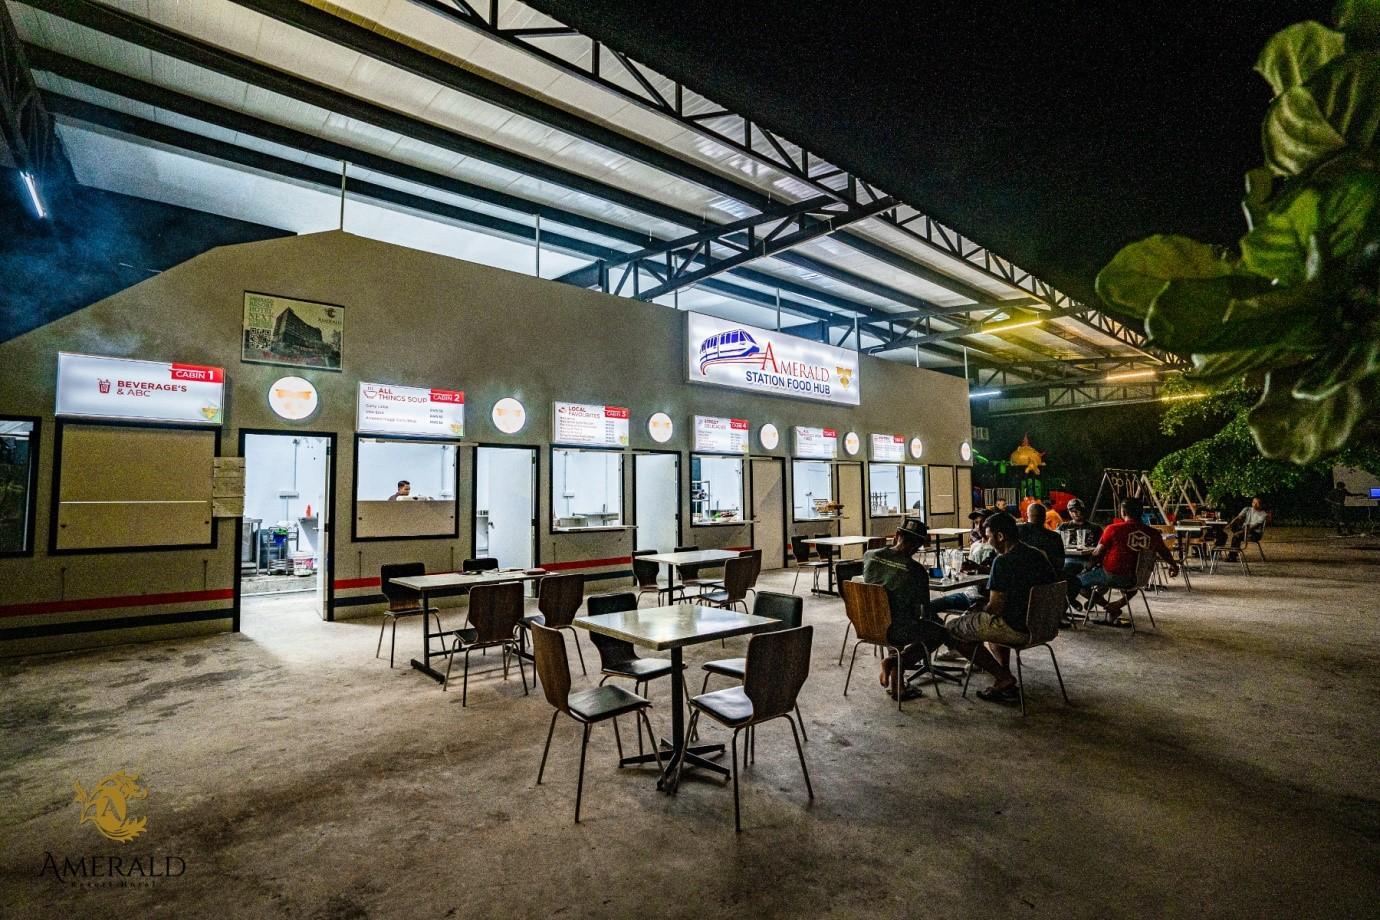 Desaru Amerald Station Food Hub Resort Hotel Johor Malaysia